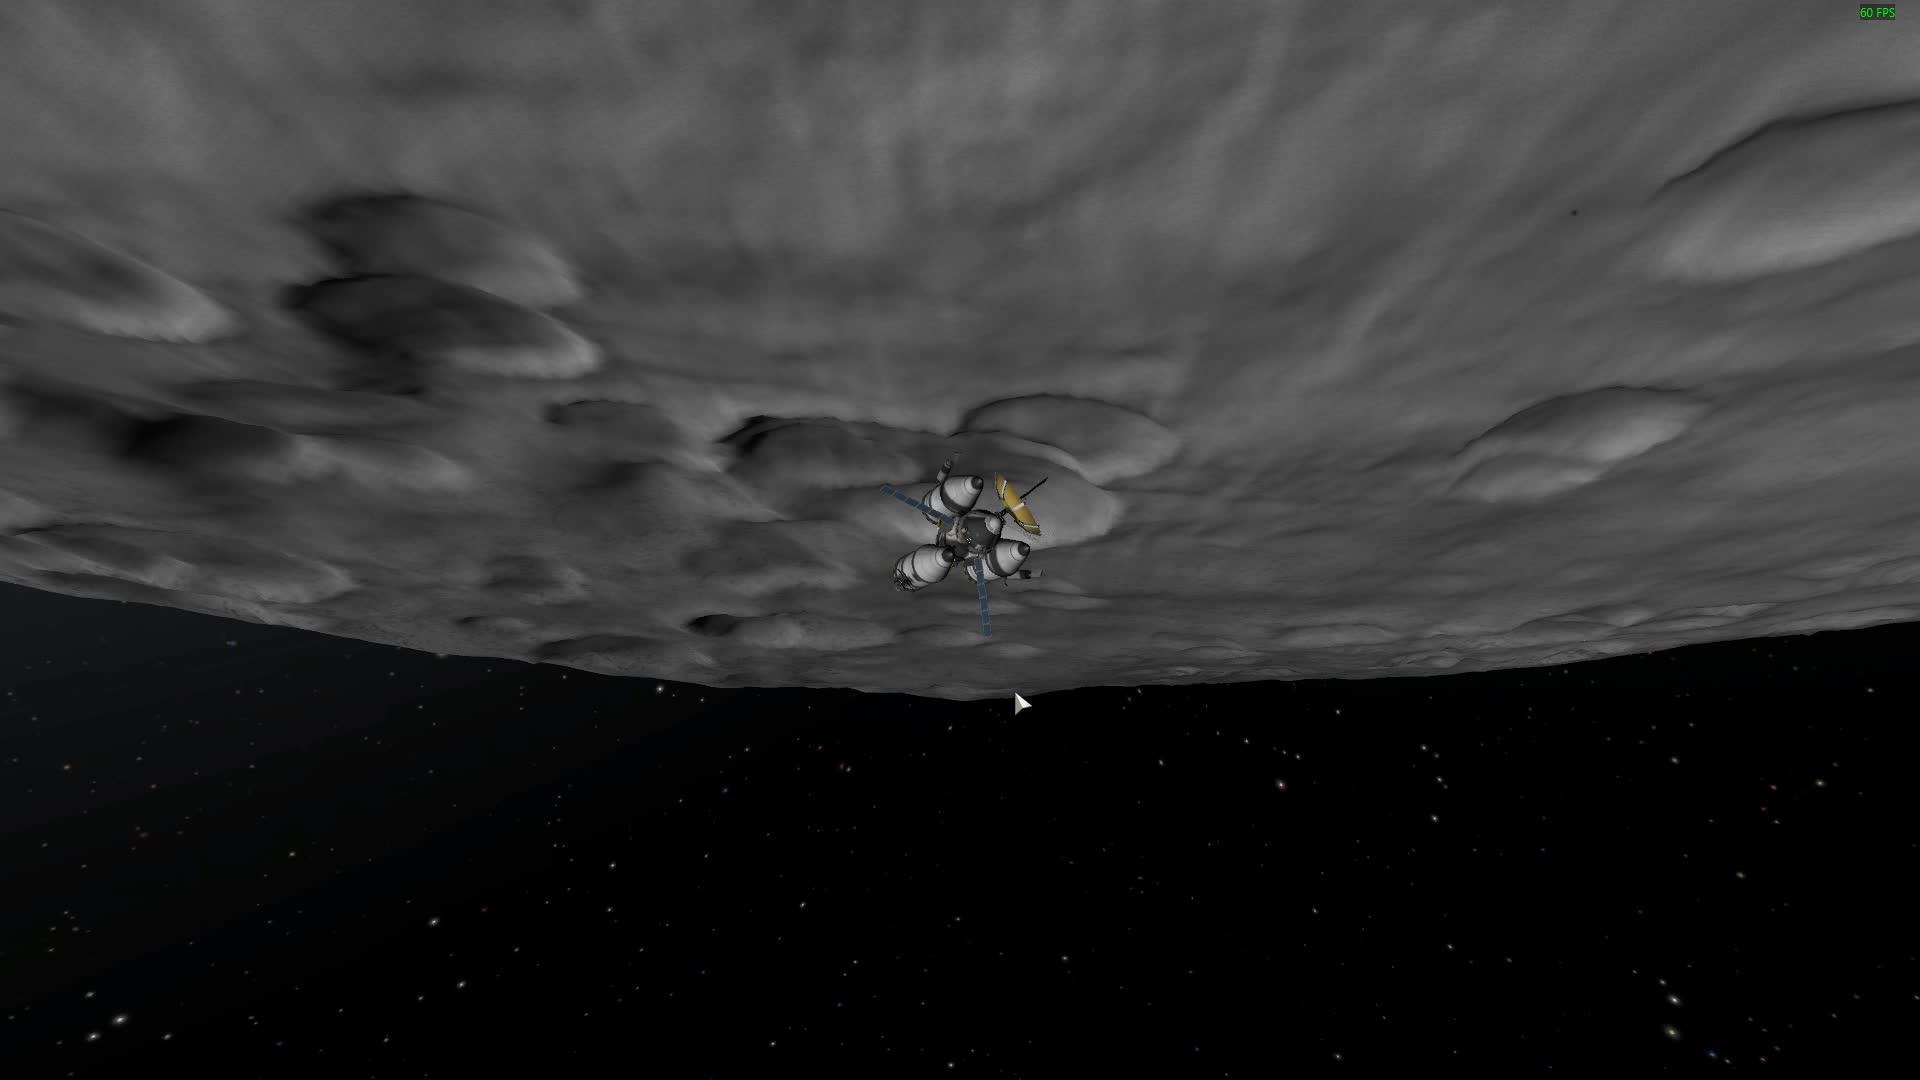 Kerbal Space Program 2018.04.25 - 18.21.07.01 GIFs